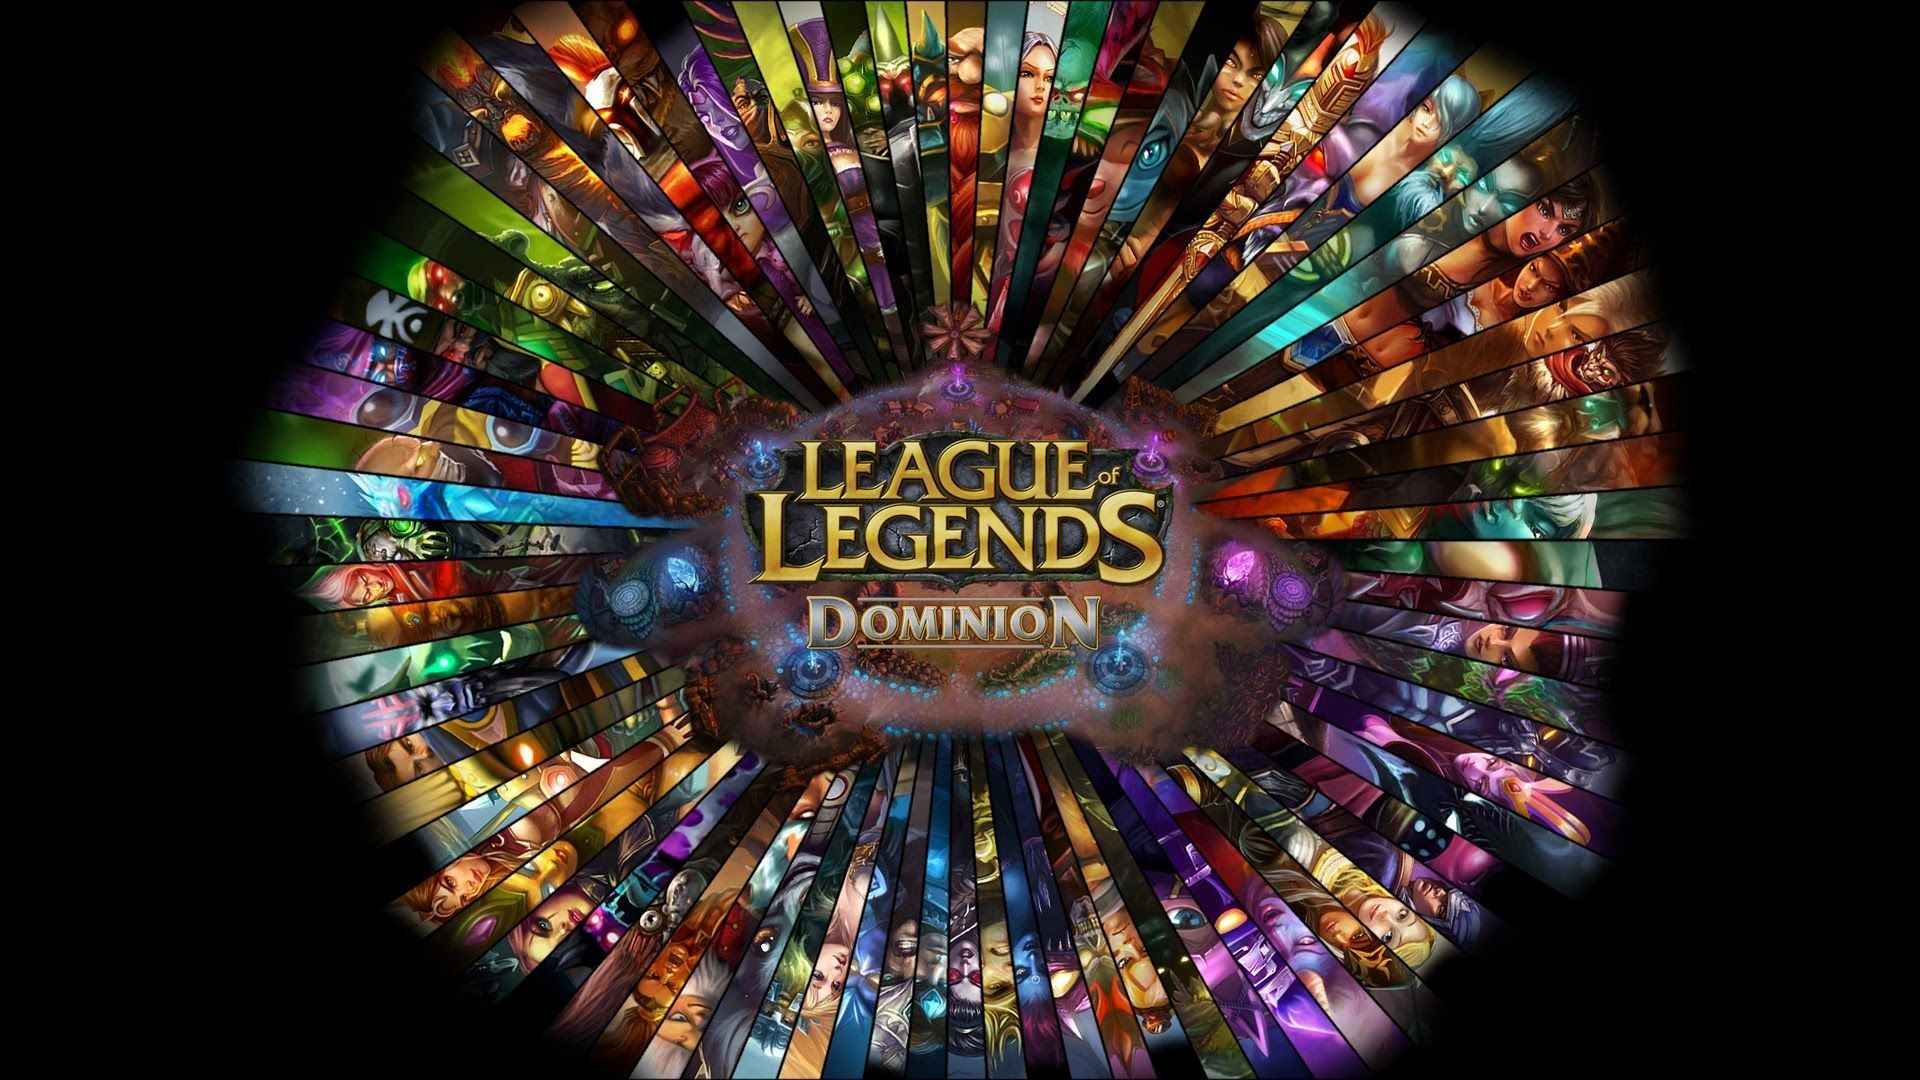 league-of-legends-dominion-champions-hd-wallpaper-1920×1080.